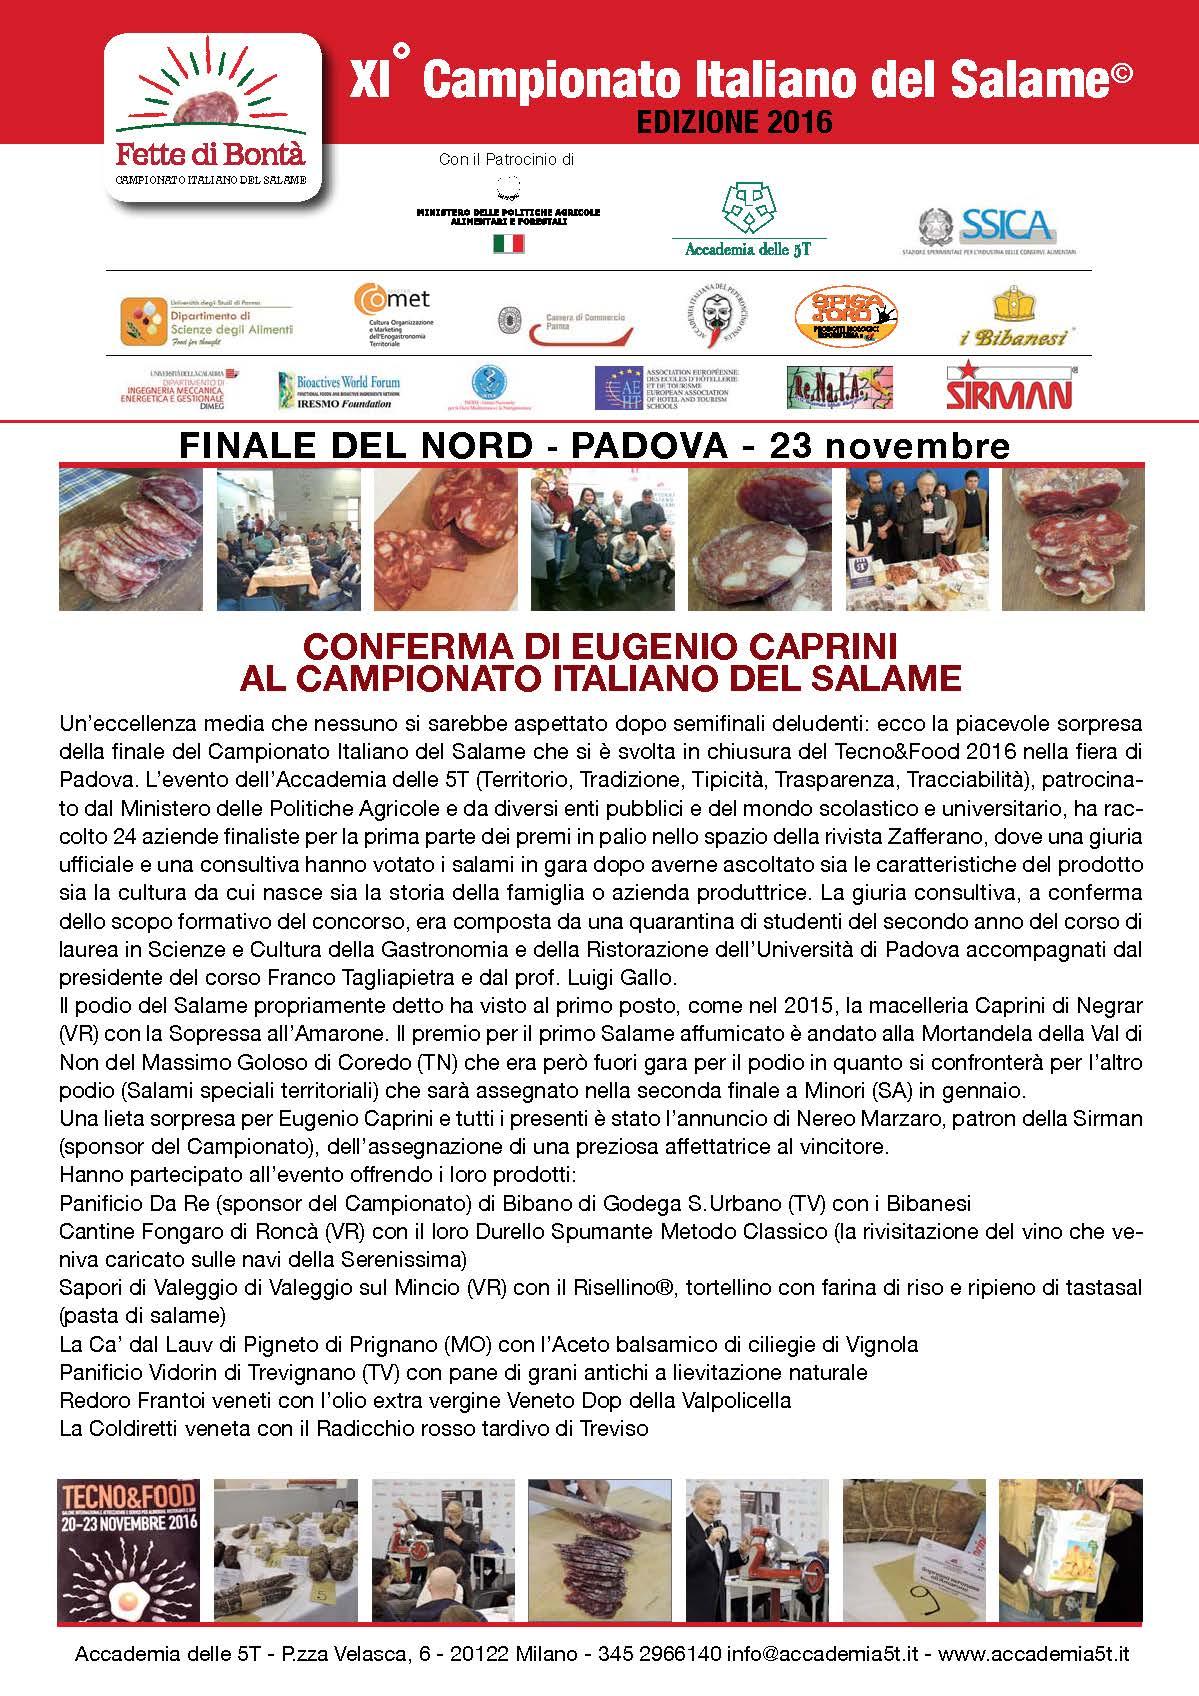 vincitori_finaledelnord_padova_161123_page_1